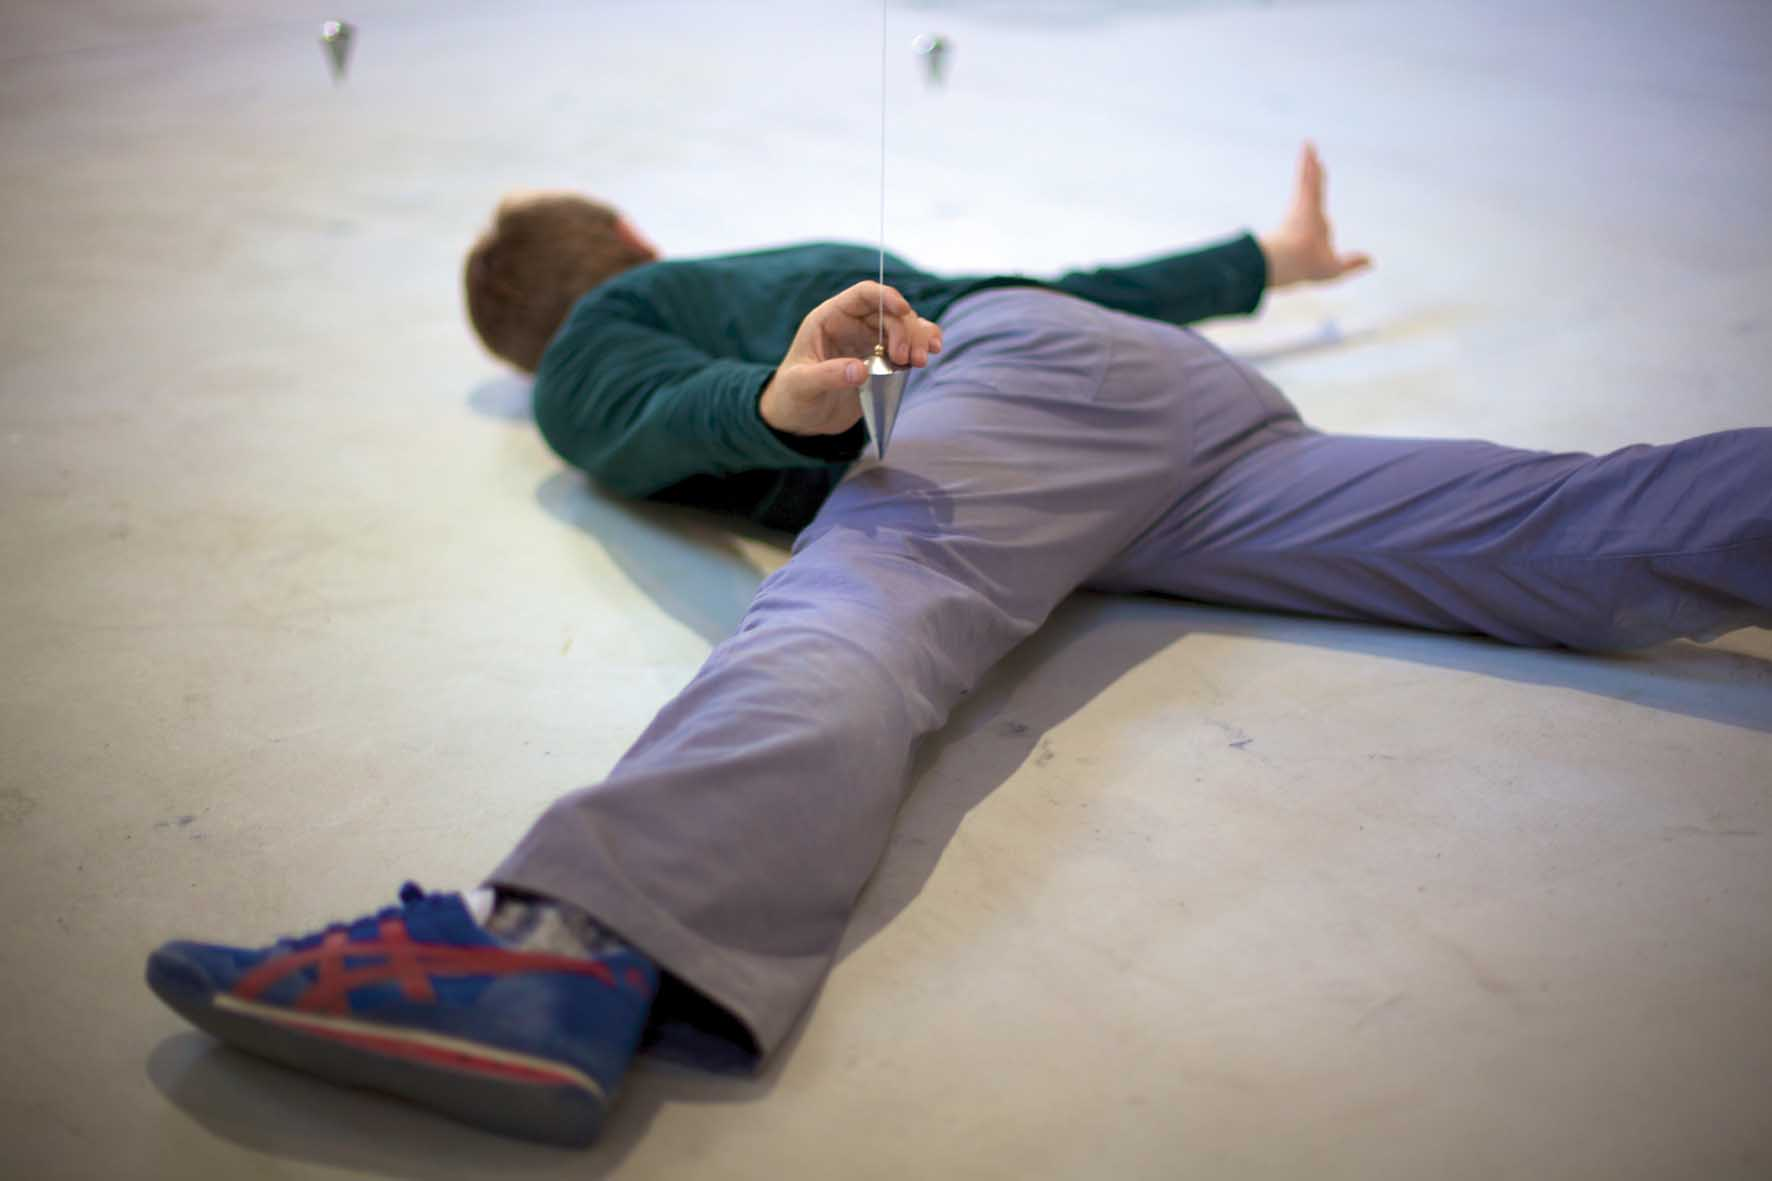 Festival Biennale danza venezia Nowhere and everywhere at the same time - performer Brock Labrenz c.Philip Bussmann 1